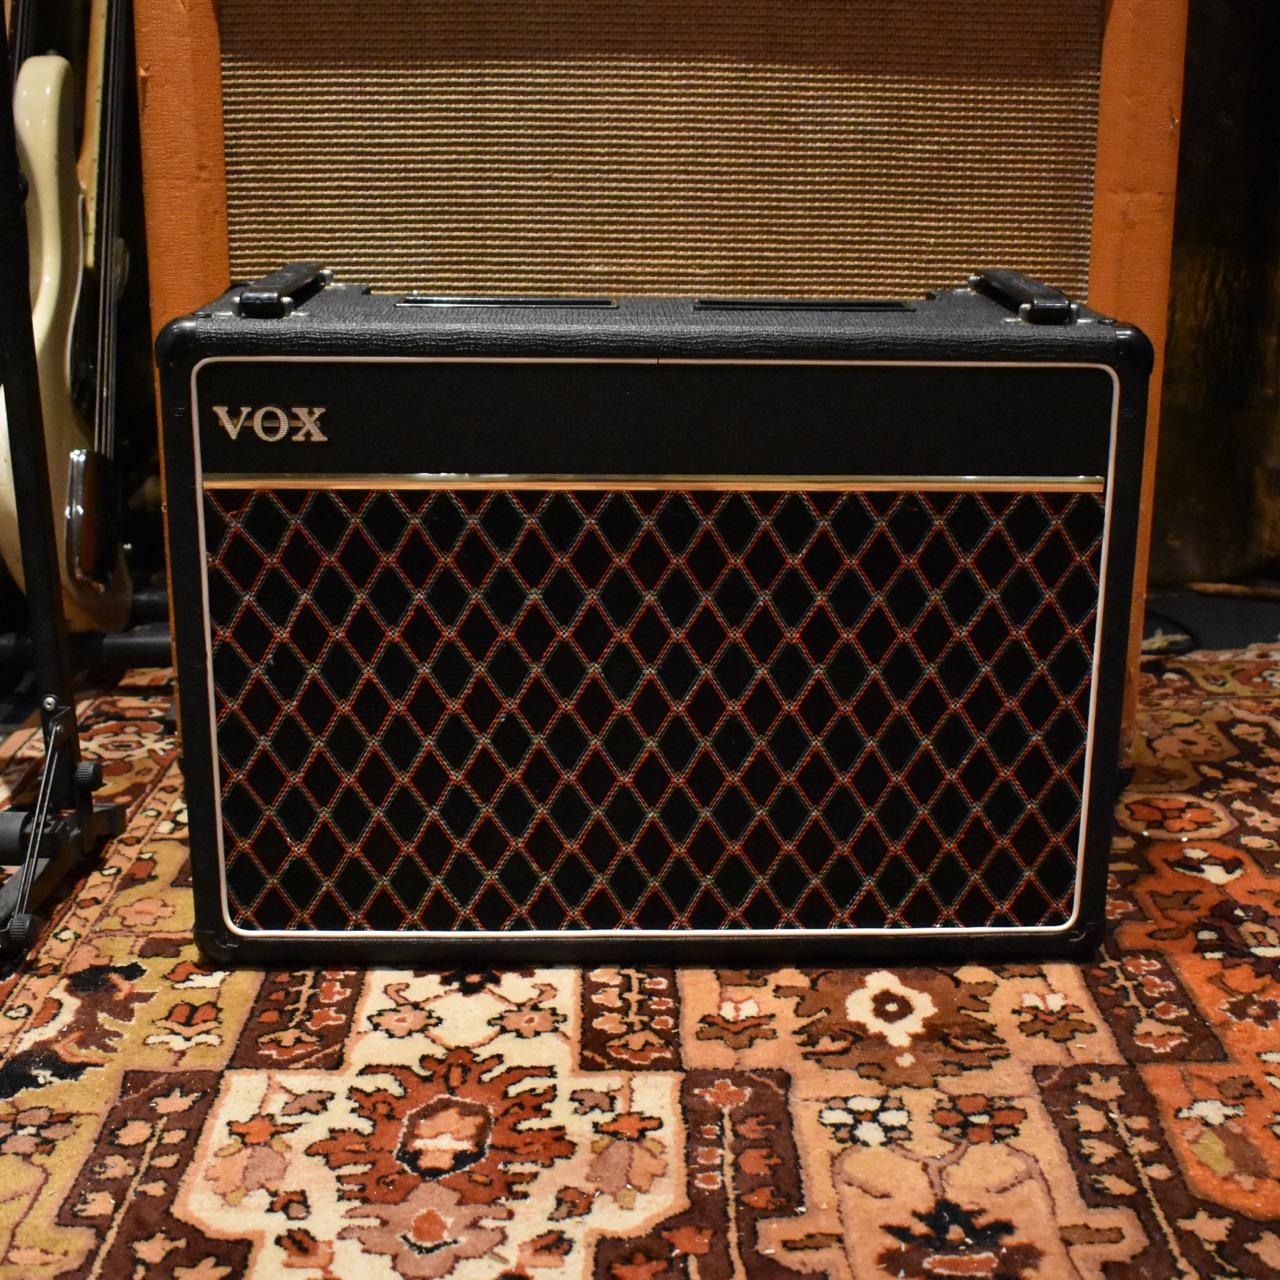 Vintage 1980s Vox V15 2x10 Combo Valve Amplifier